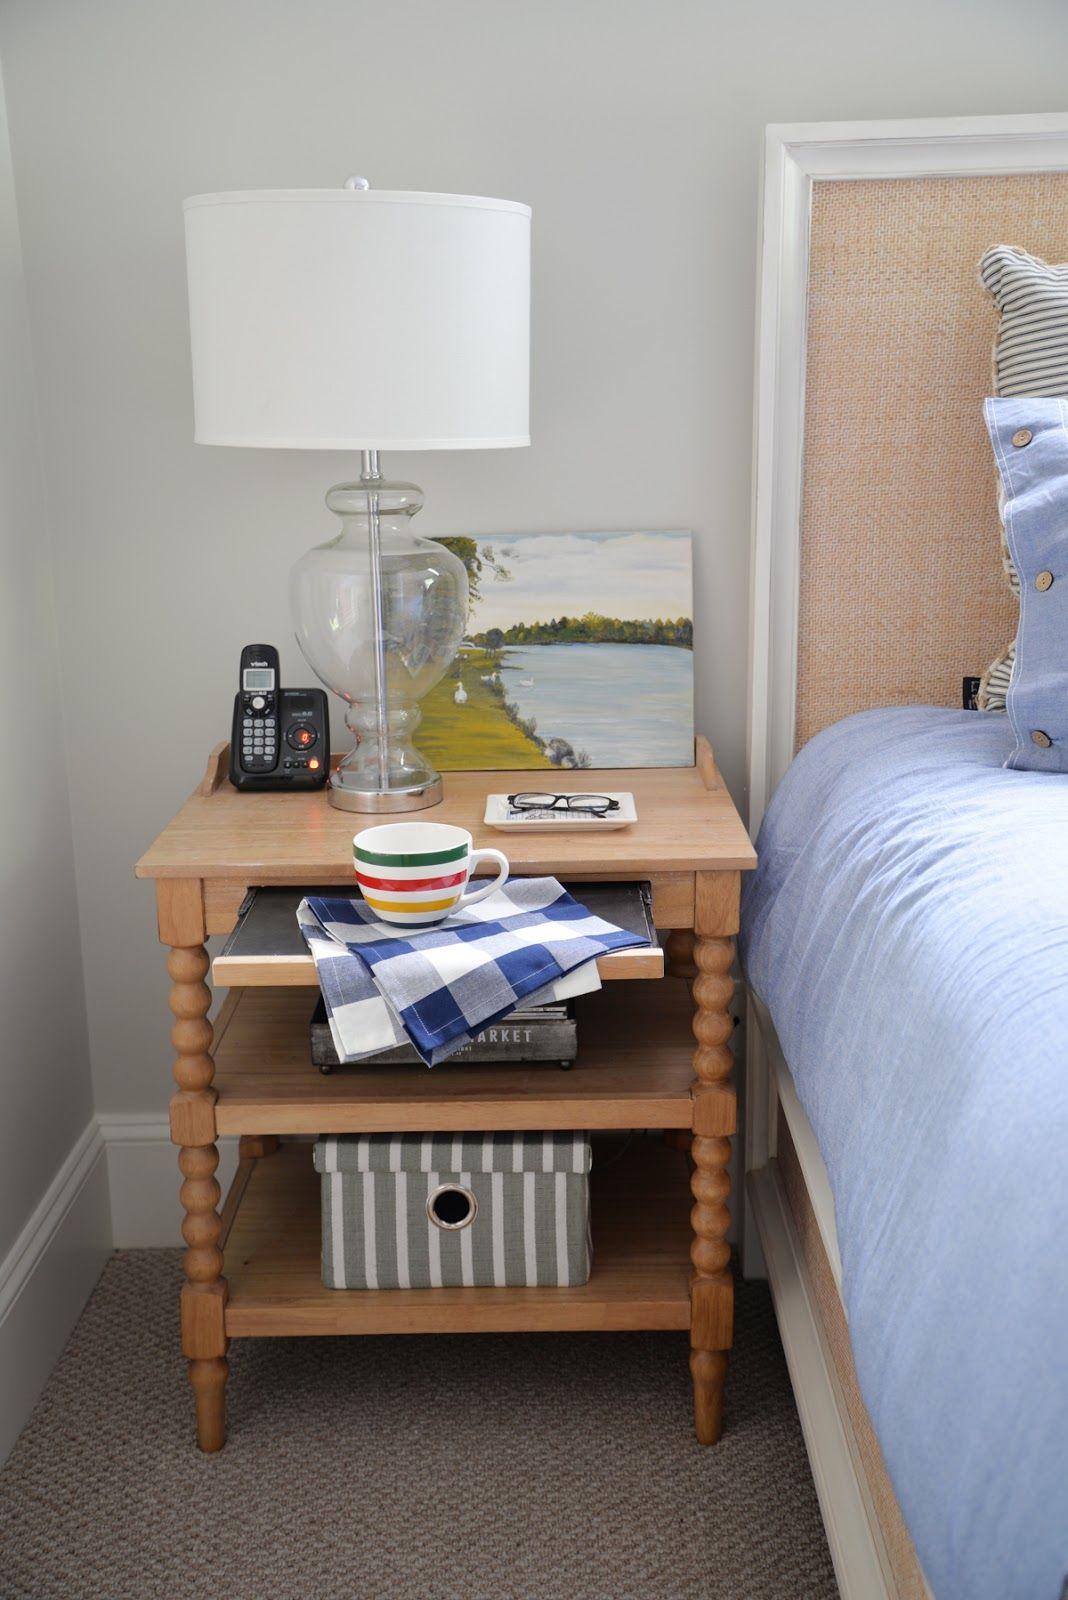 Spool Nightstand, Rattan Headboard, Country Cottage Bedroomu2026